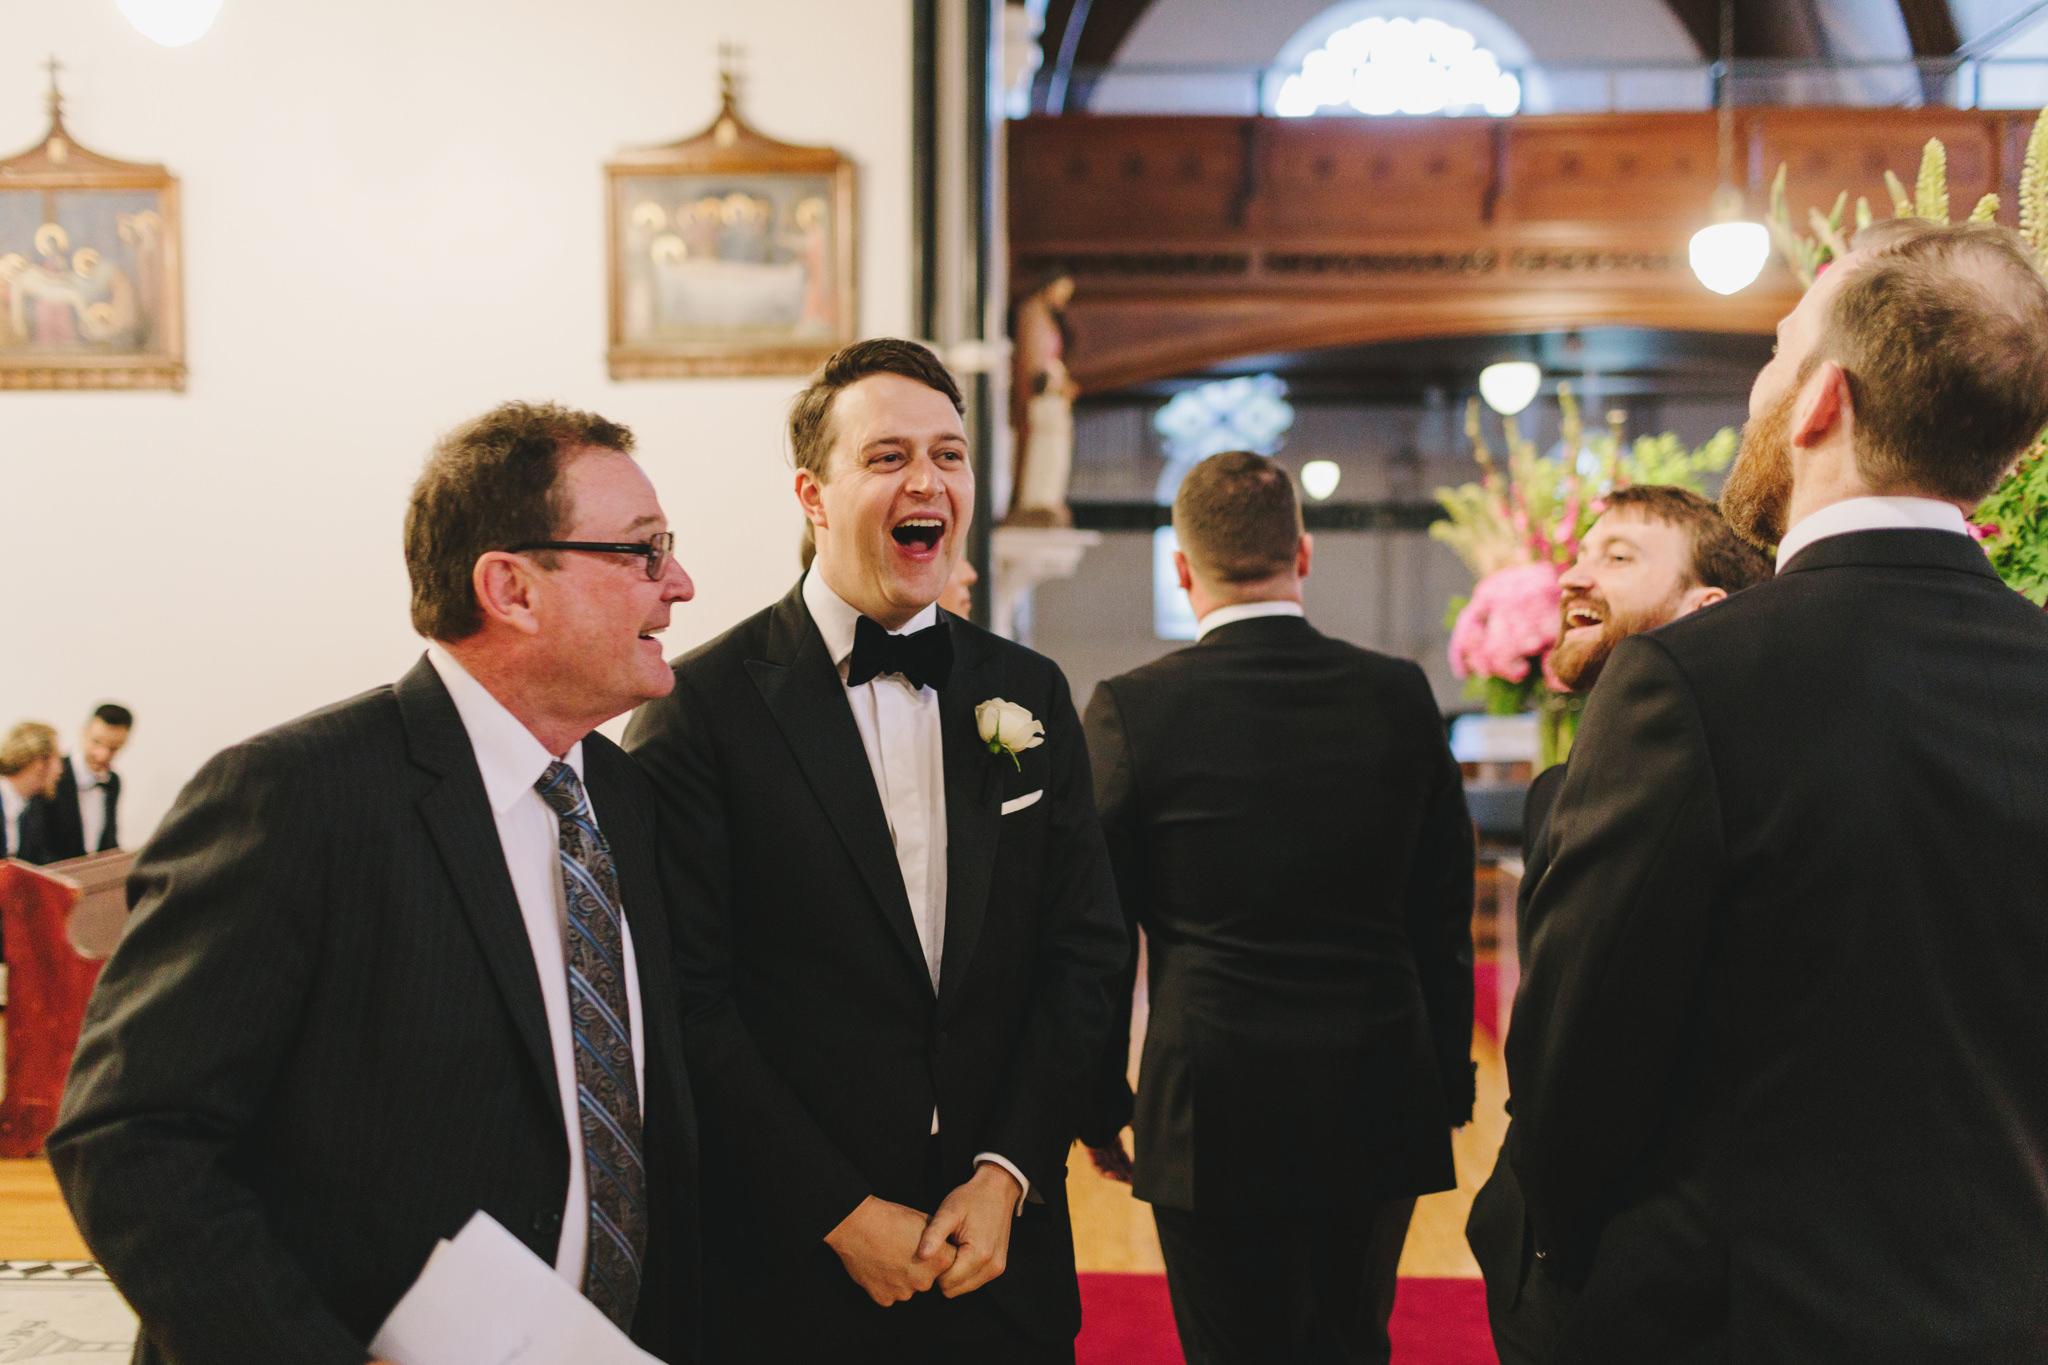 Abbotsford_Convent_Wedding_Peter_Anna043.JPG